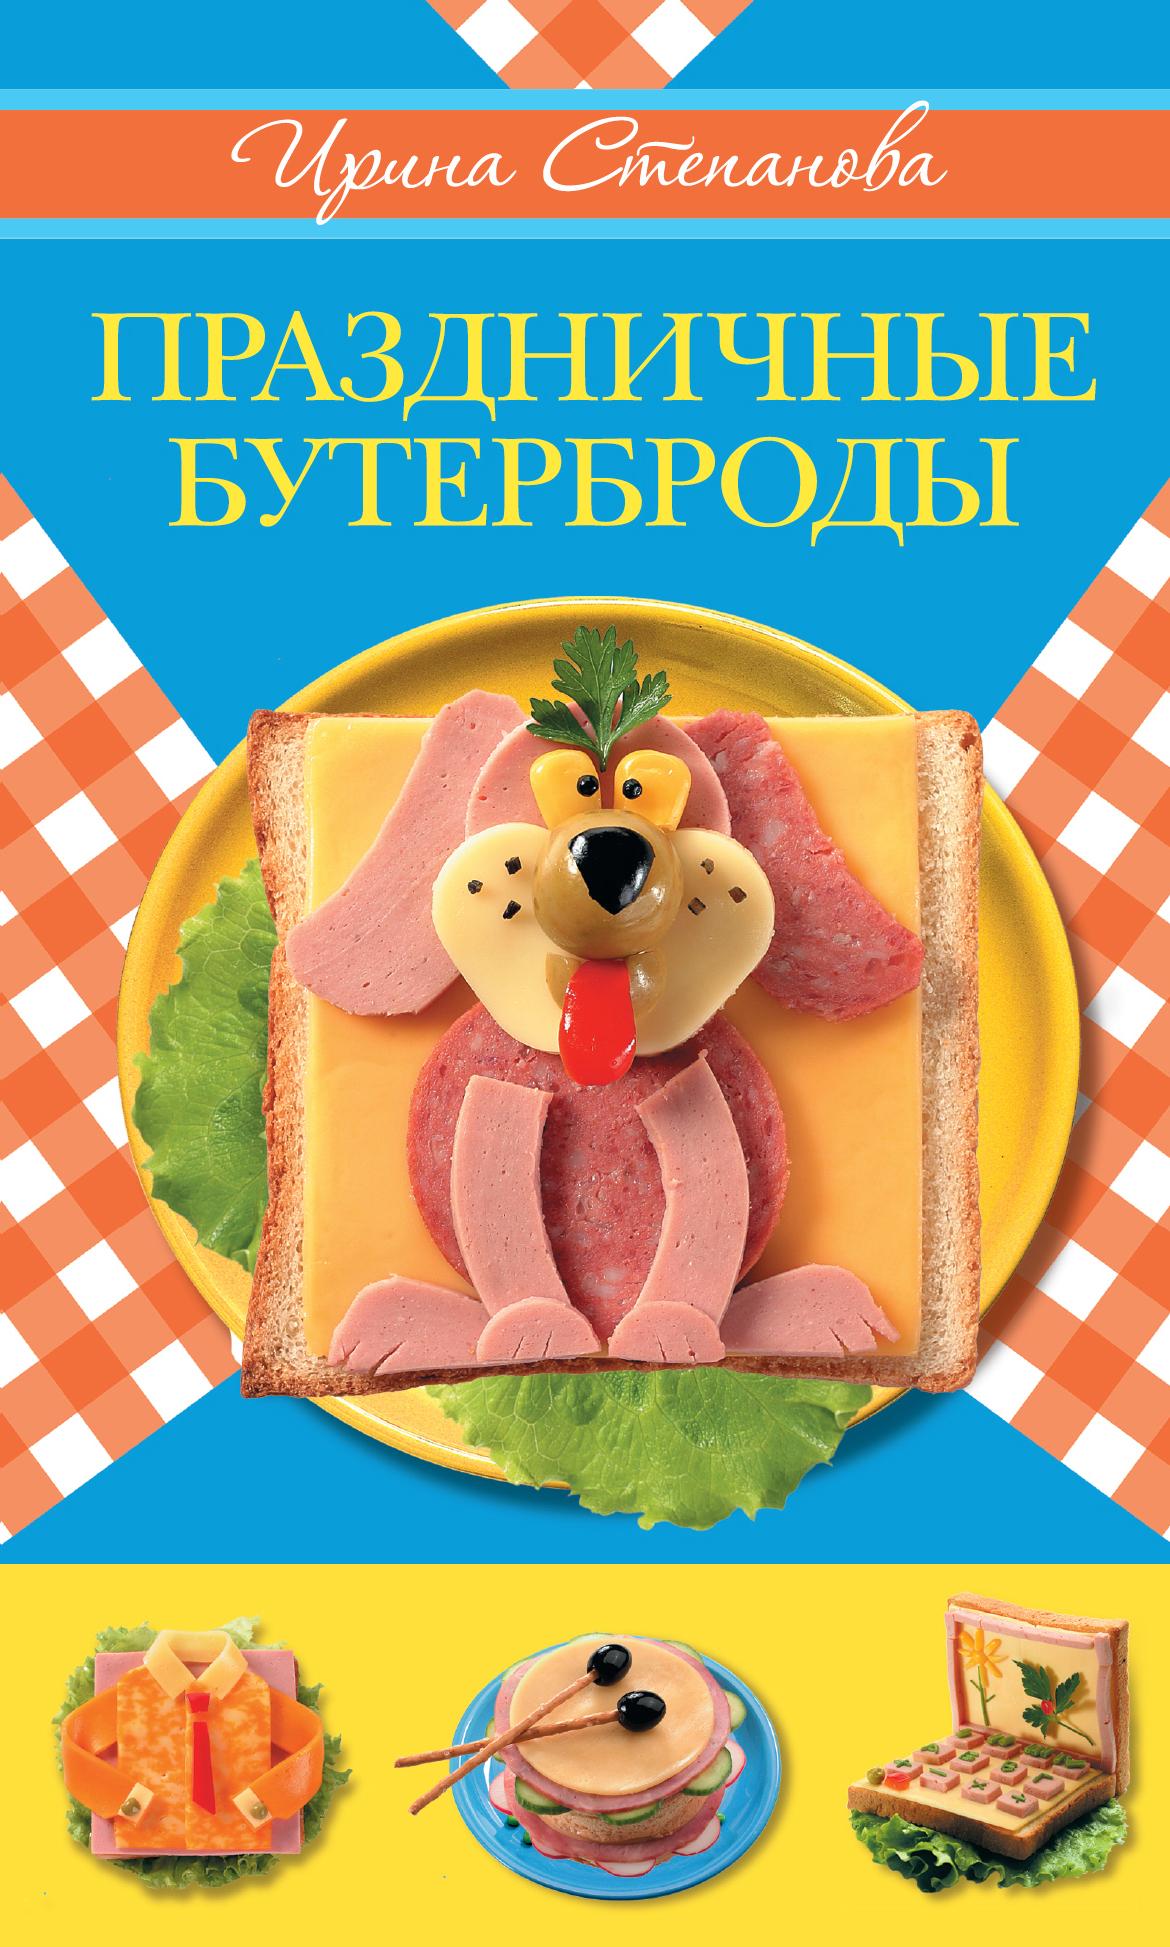 Праздничные бутерброды от book24.ru